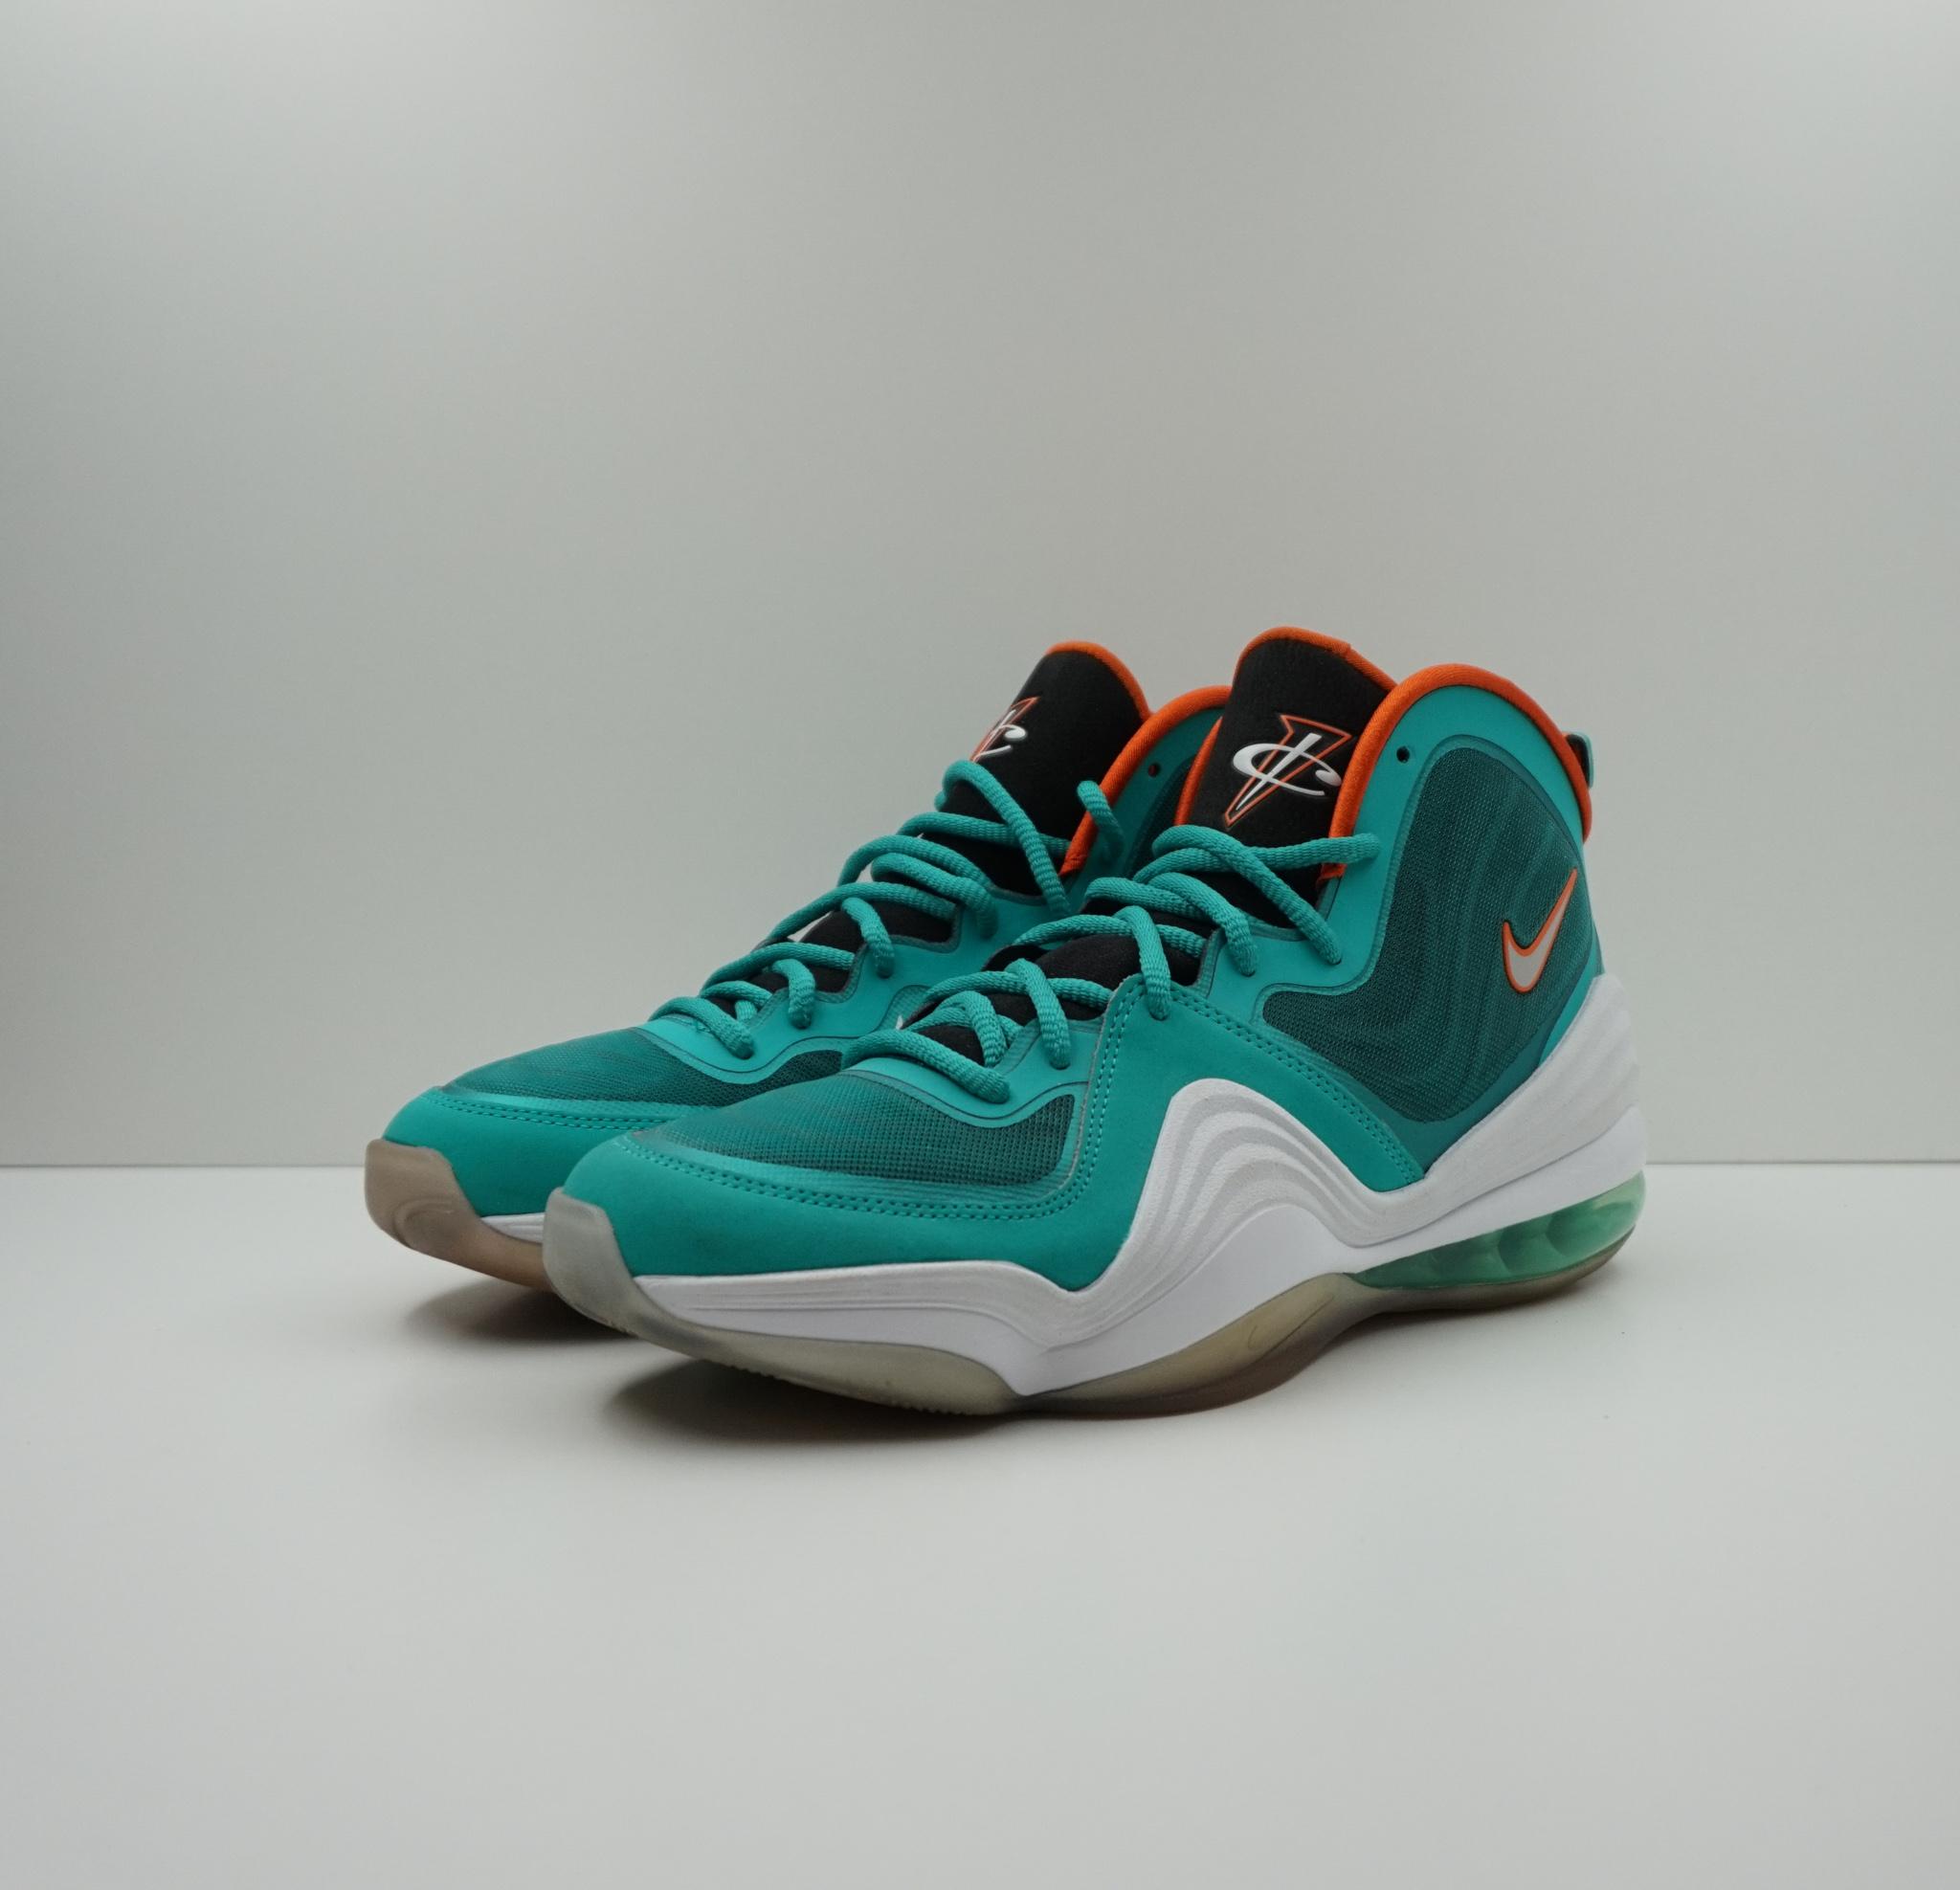 Nike Penny V Miami Dolphins